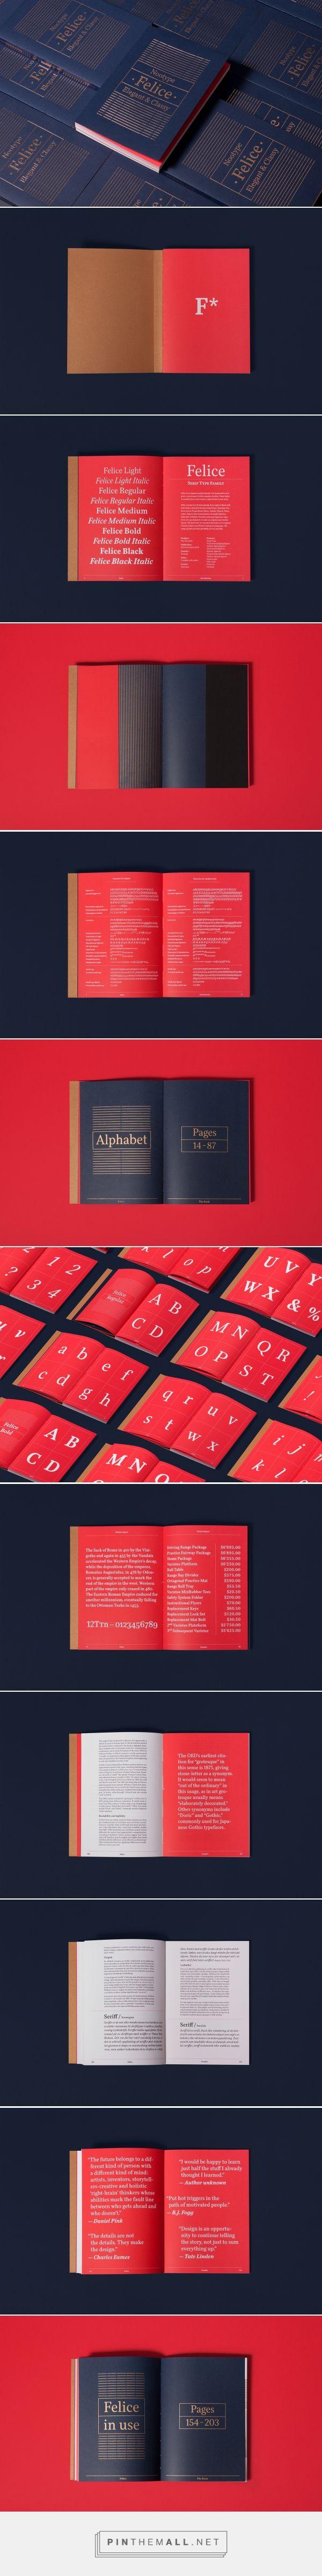 Felice the book on Behance - created via https://pinthemall.net